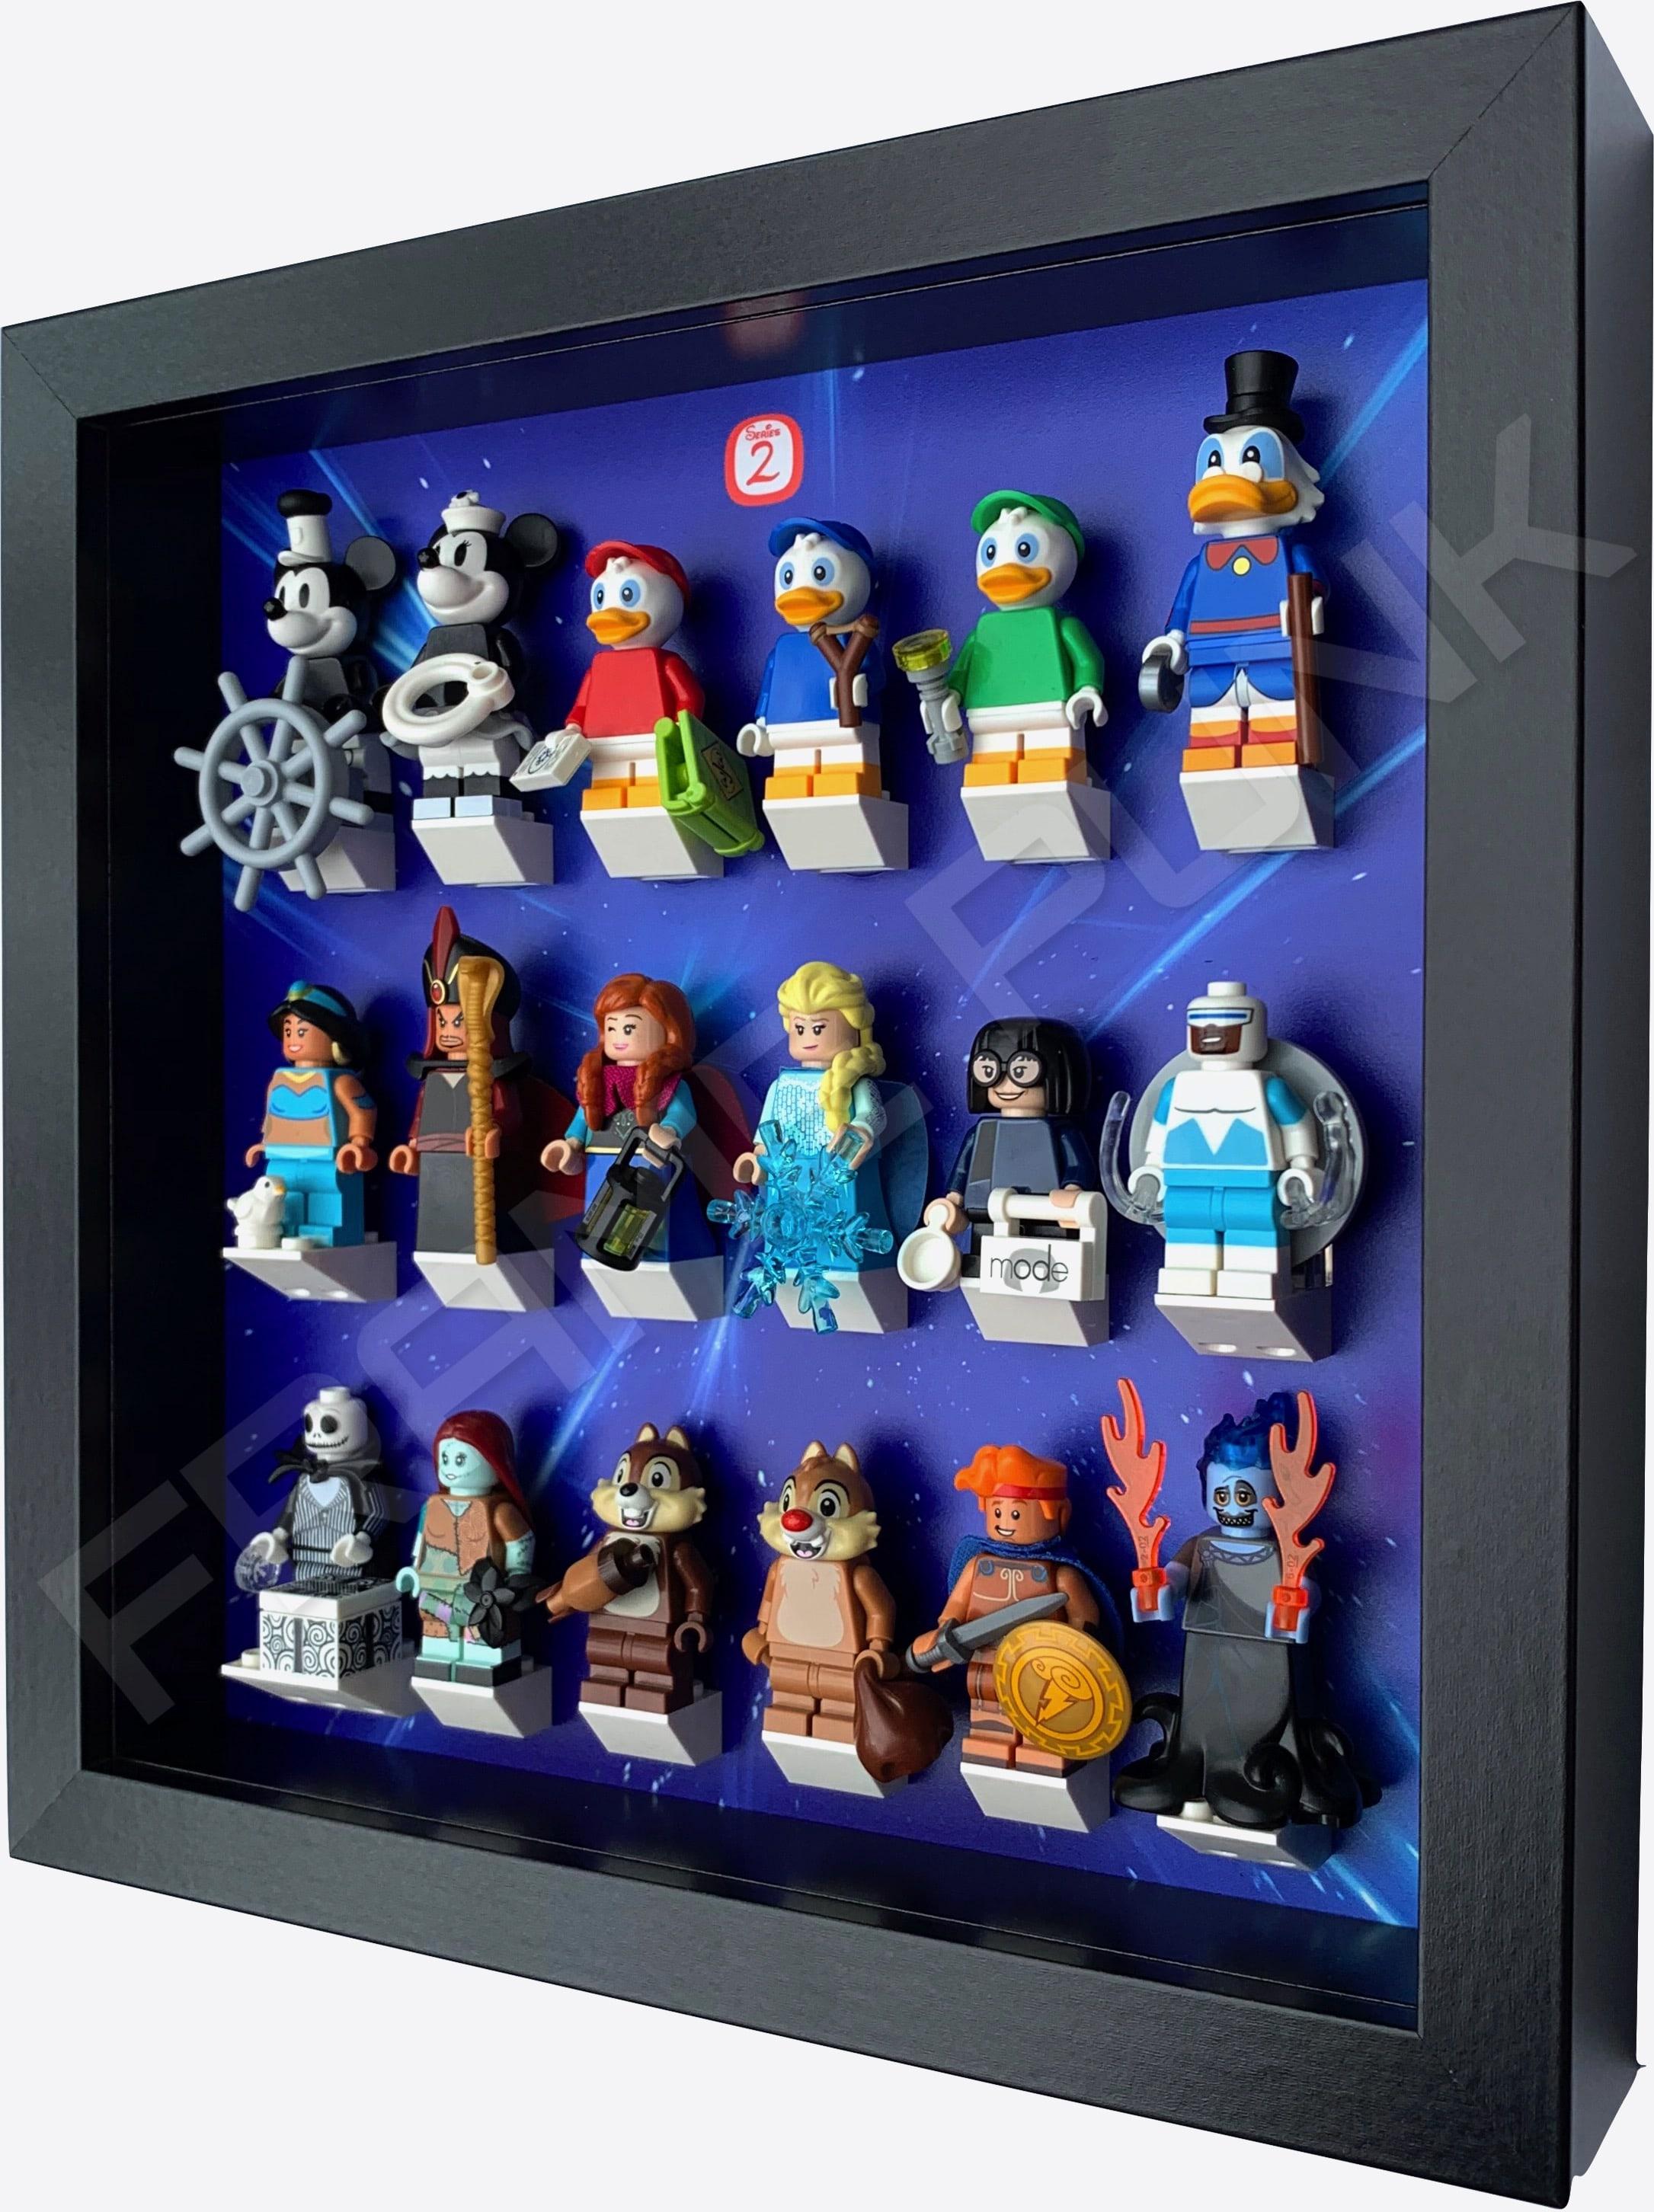 Series 2 Disney Lego Minifigure Display Frame - (StarryBlack)